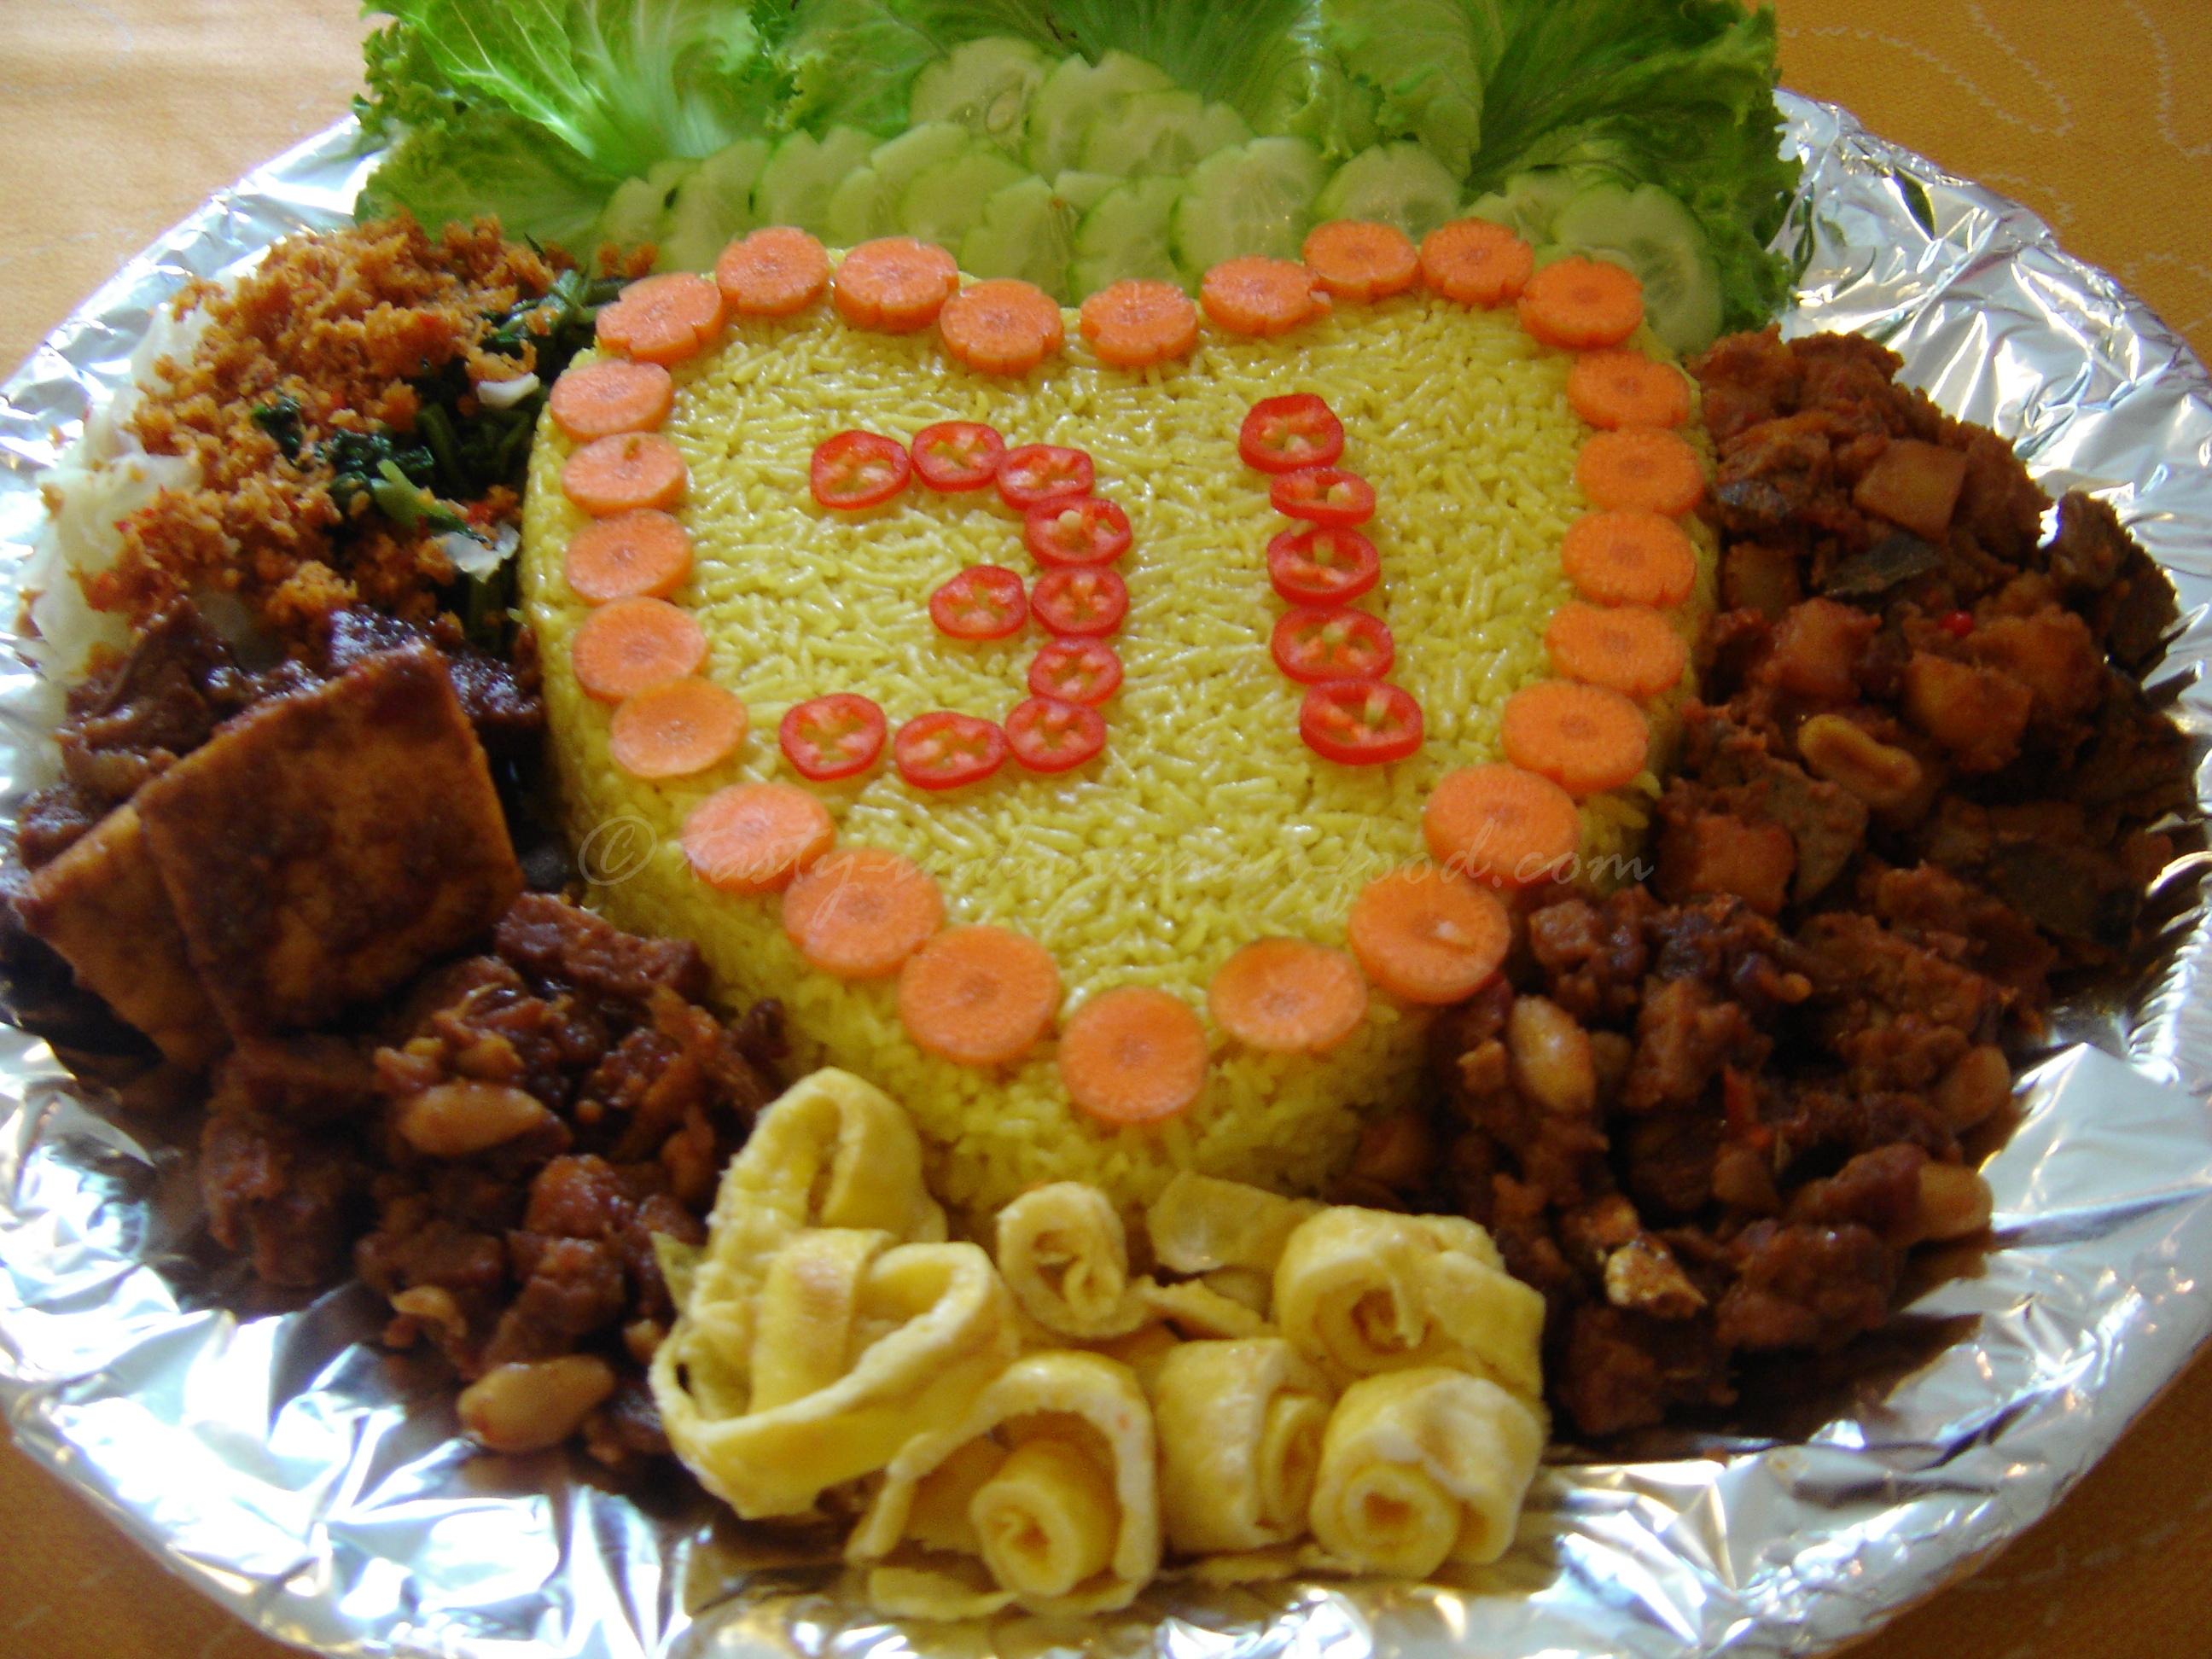 Tasty indonesian food nasi kuning nasi kuning forumfinder Gallery